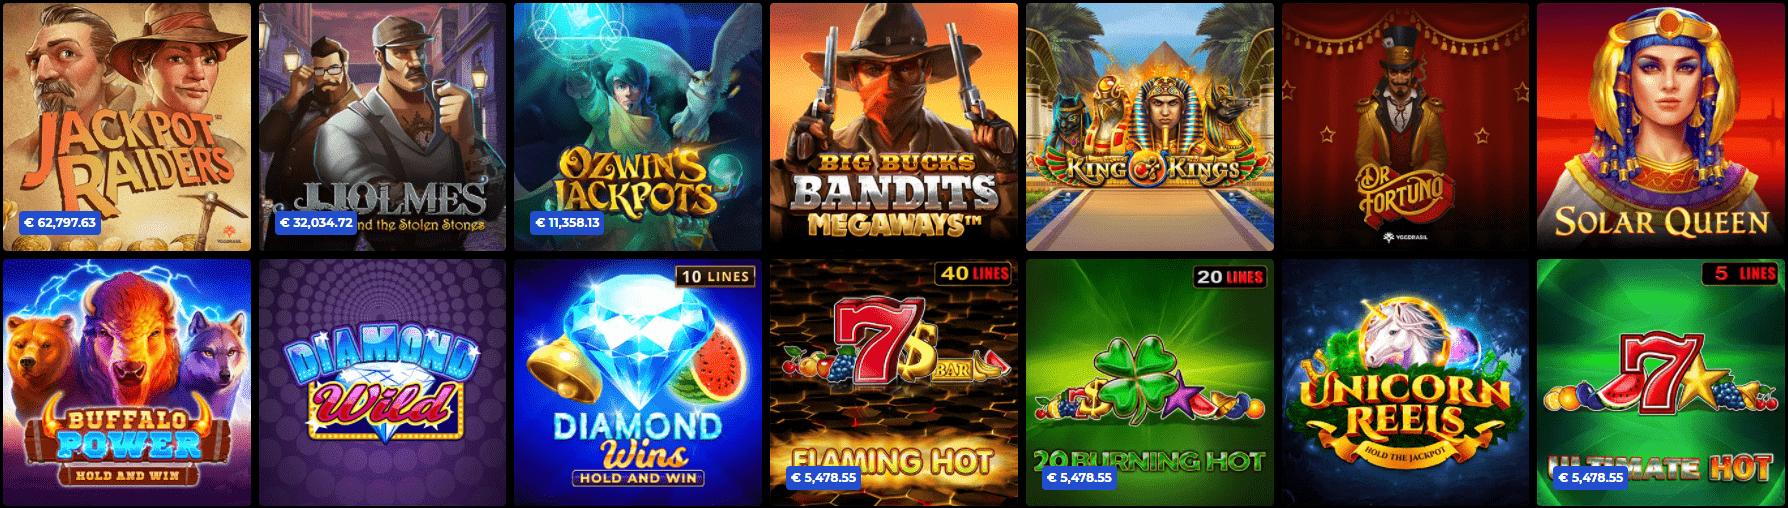 Jackpot-Spiele im N1 Casino